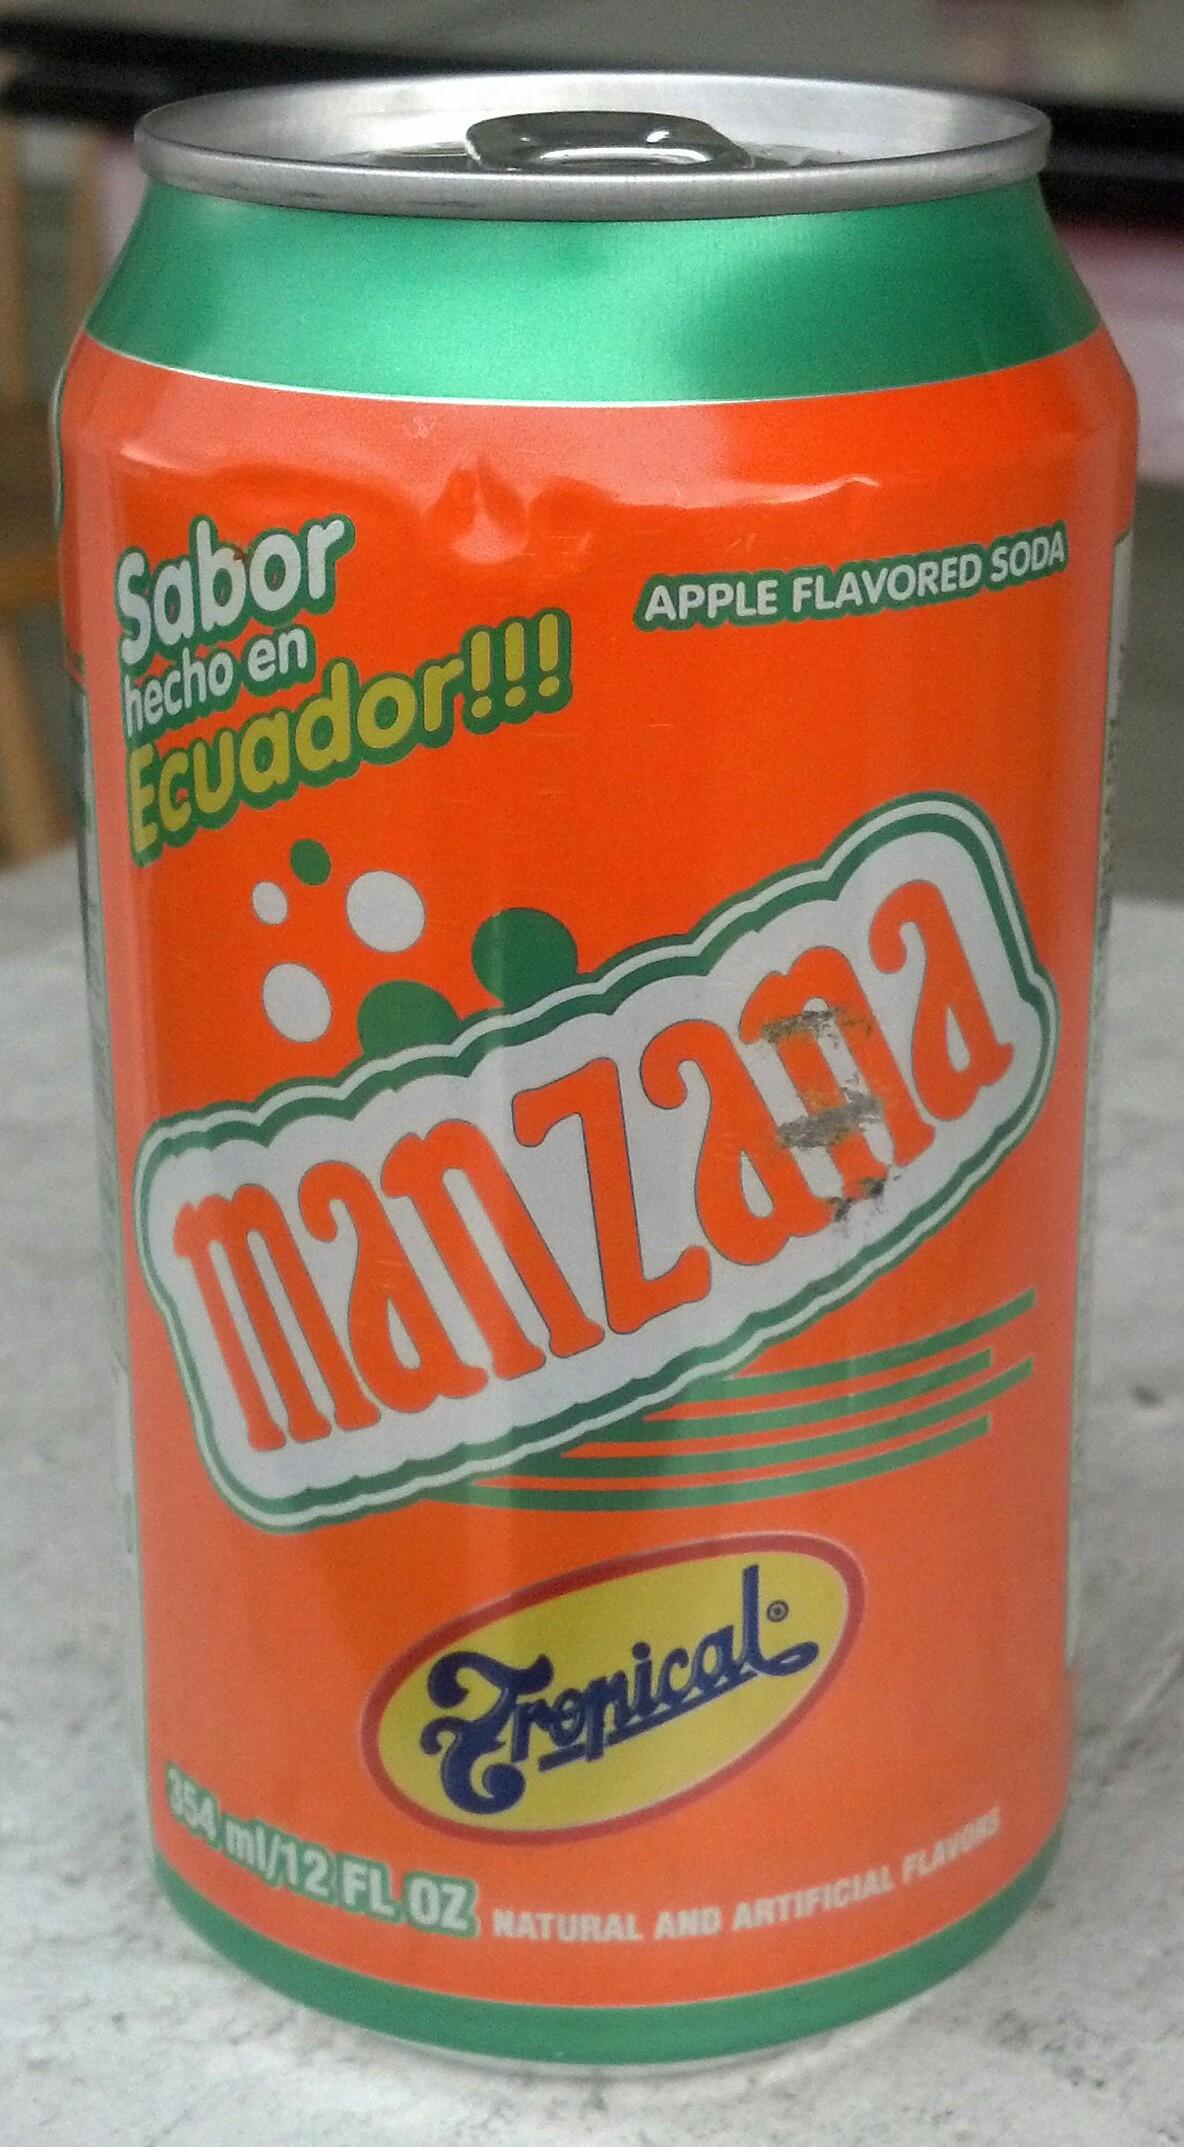 Thirsty Dudes Tropical Manzana